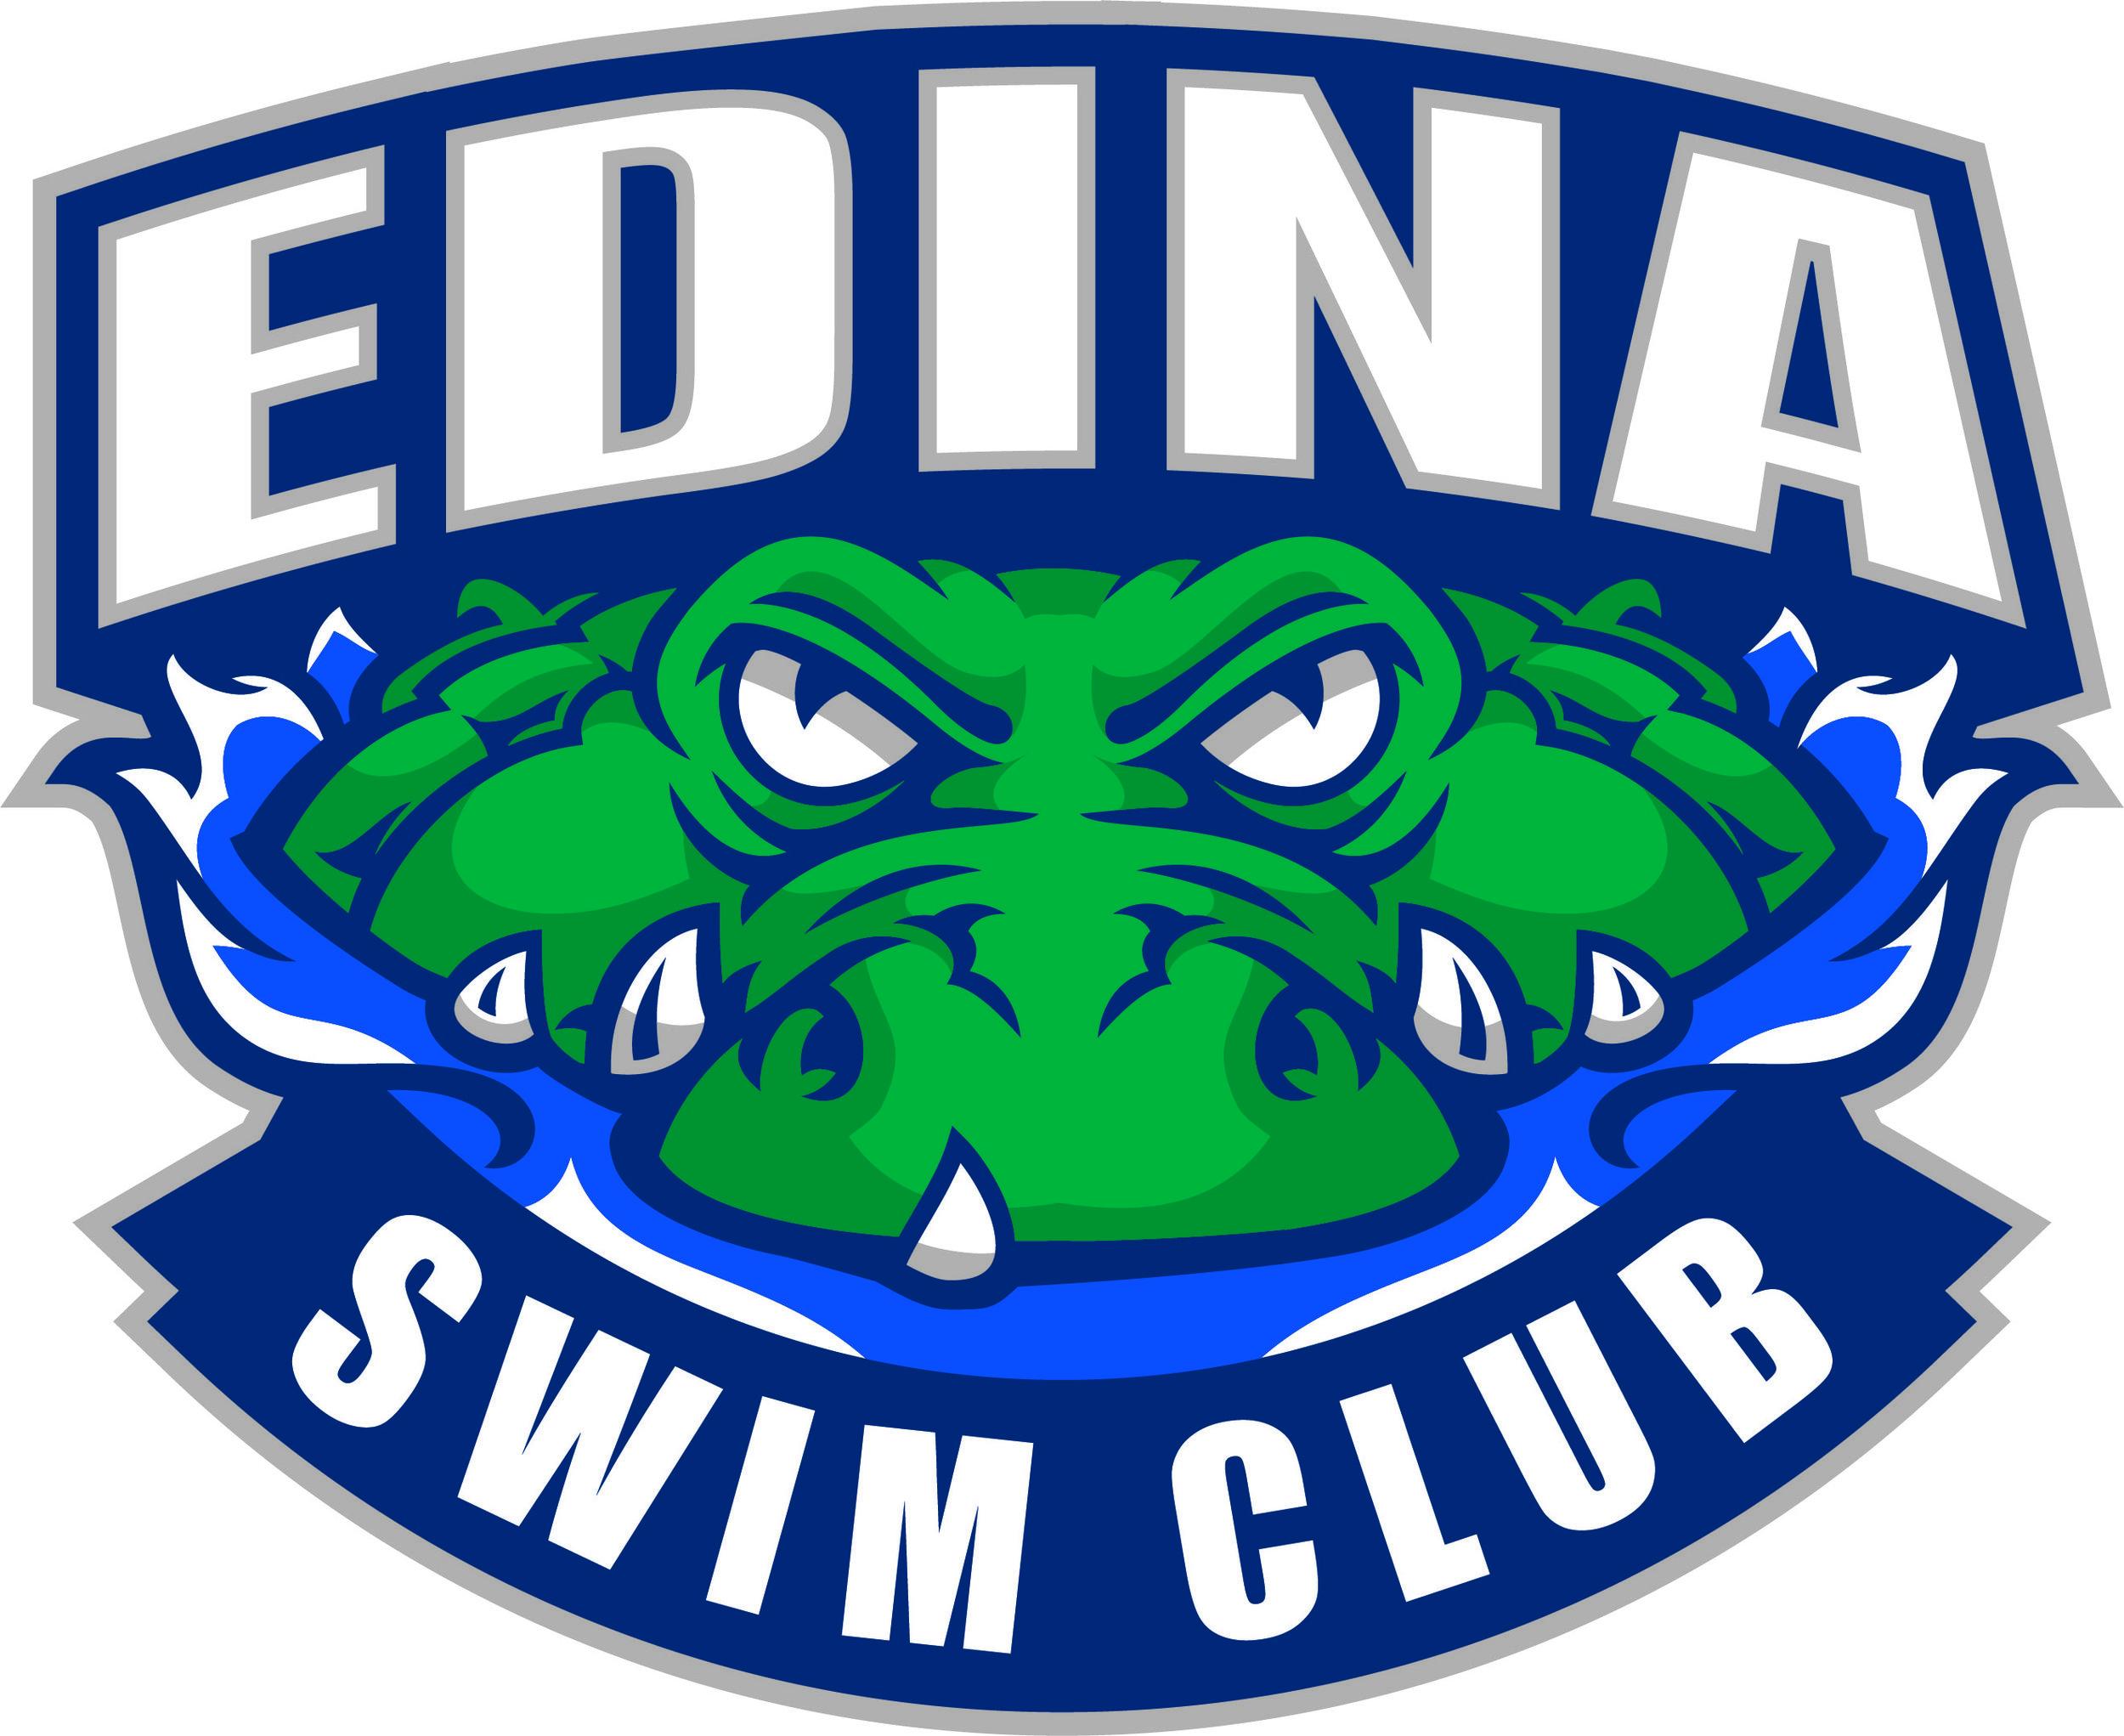 Edina Swim Club